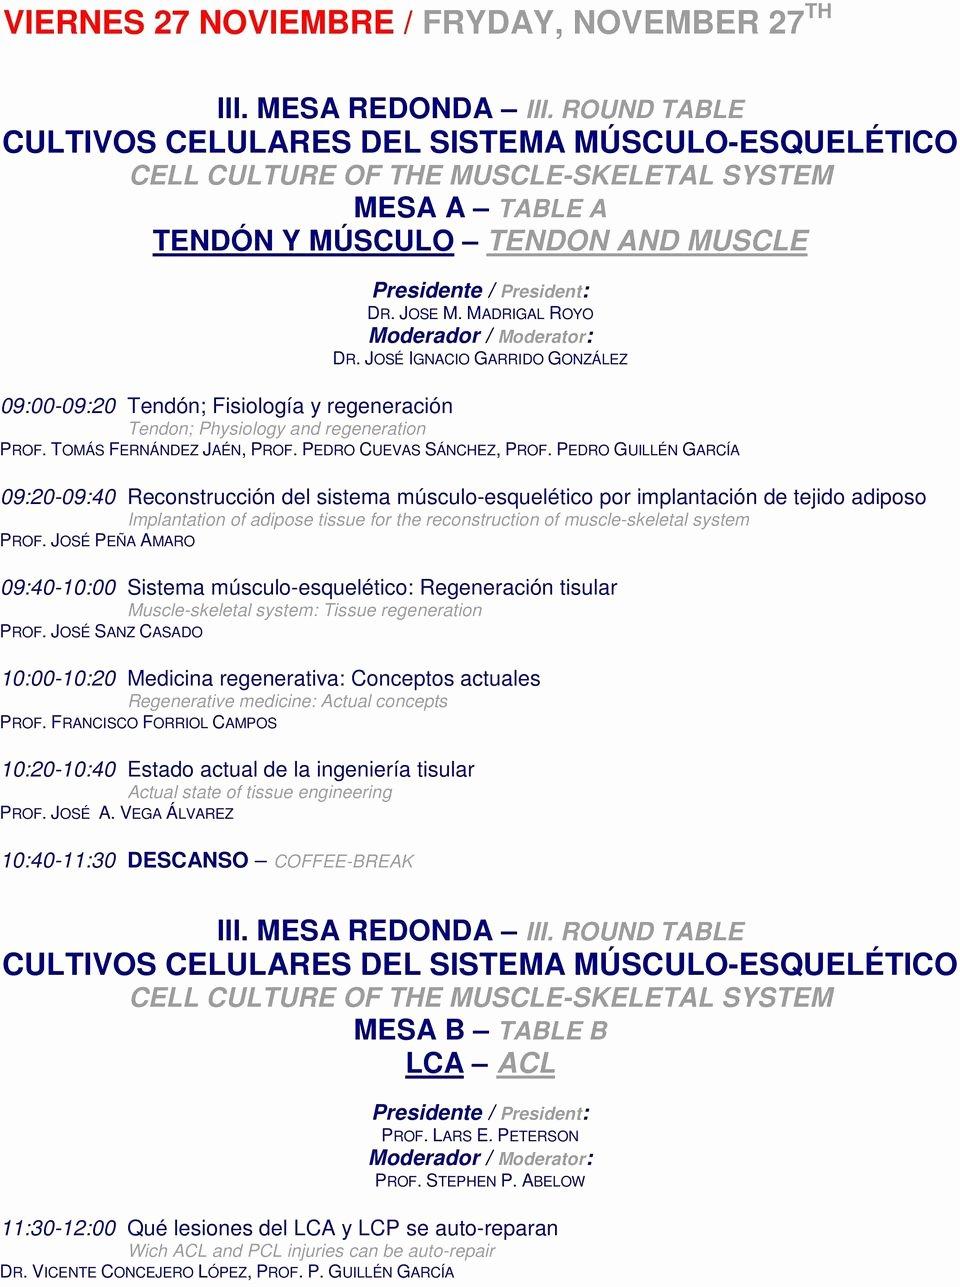 Letter to Garcia Pdf Unique Carta De Bienvenida Well E Letter Pdf